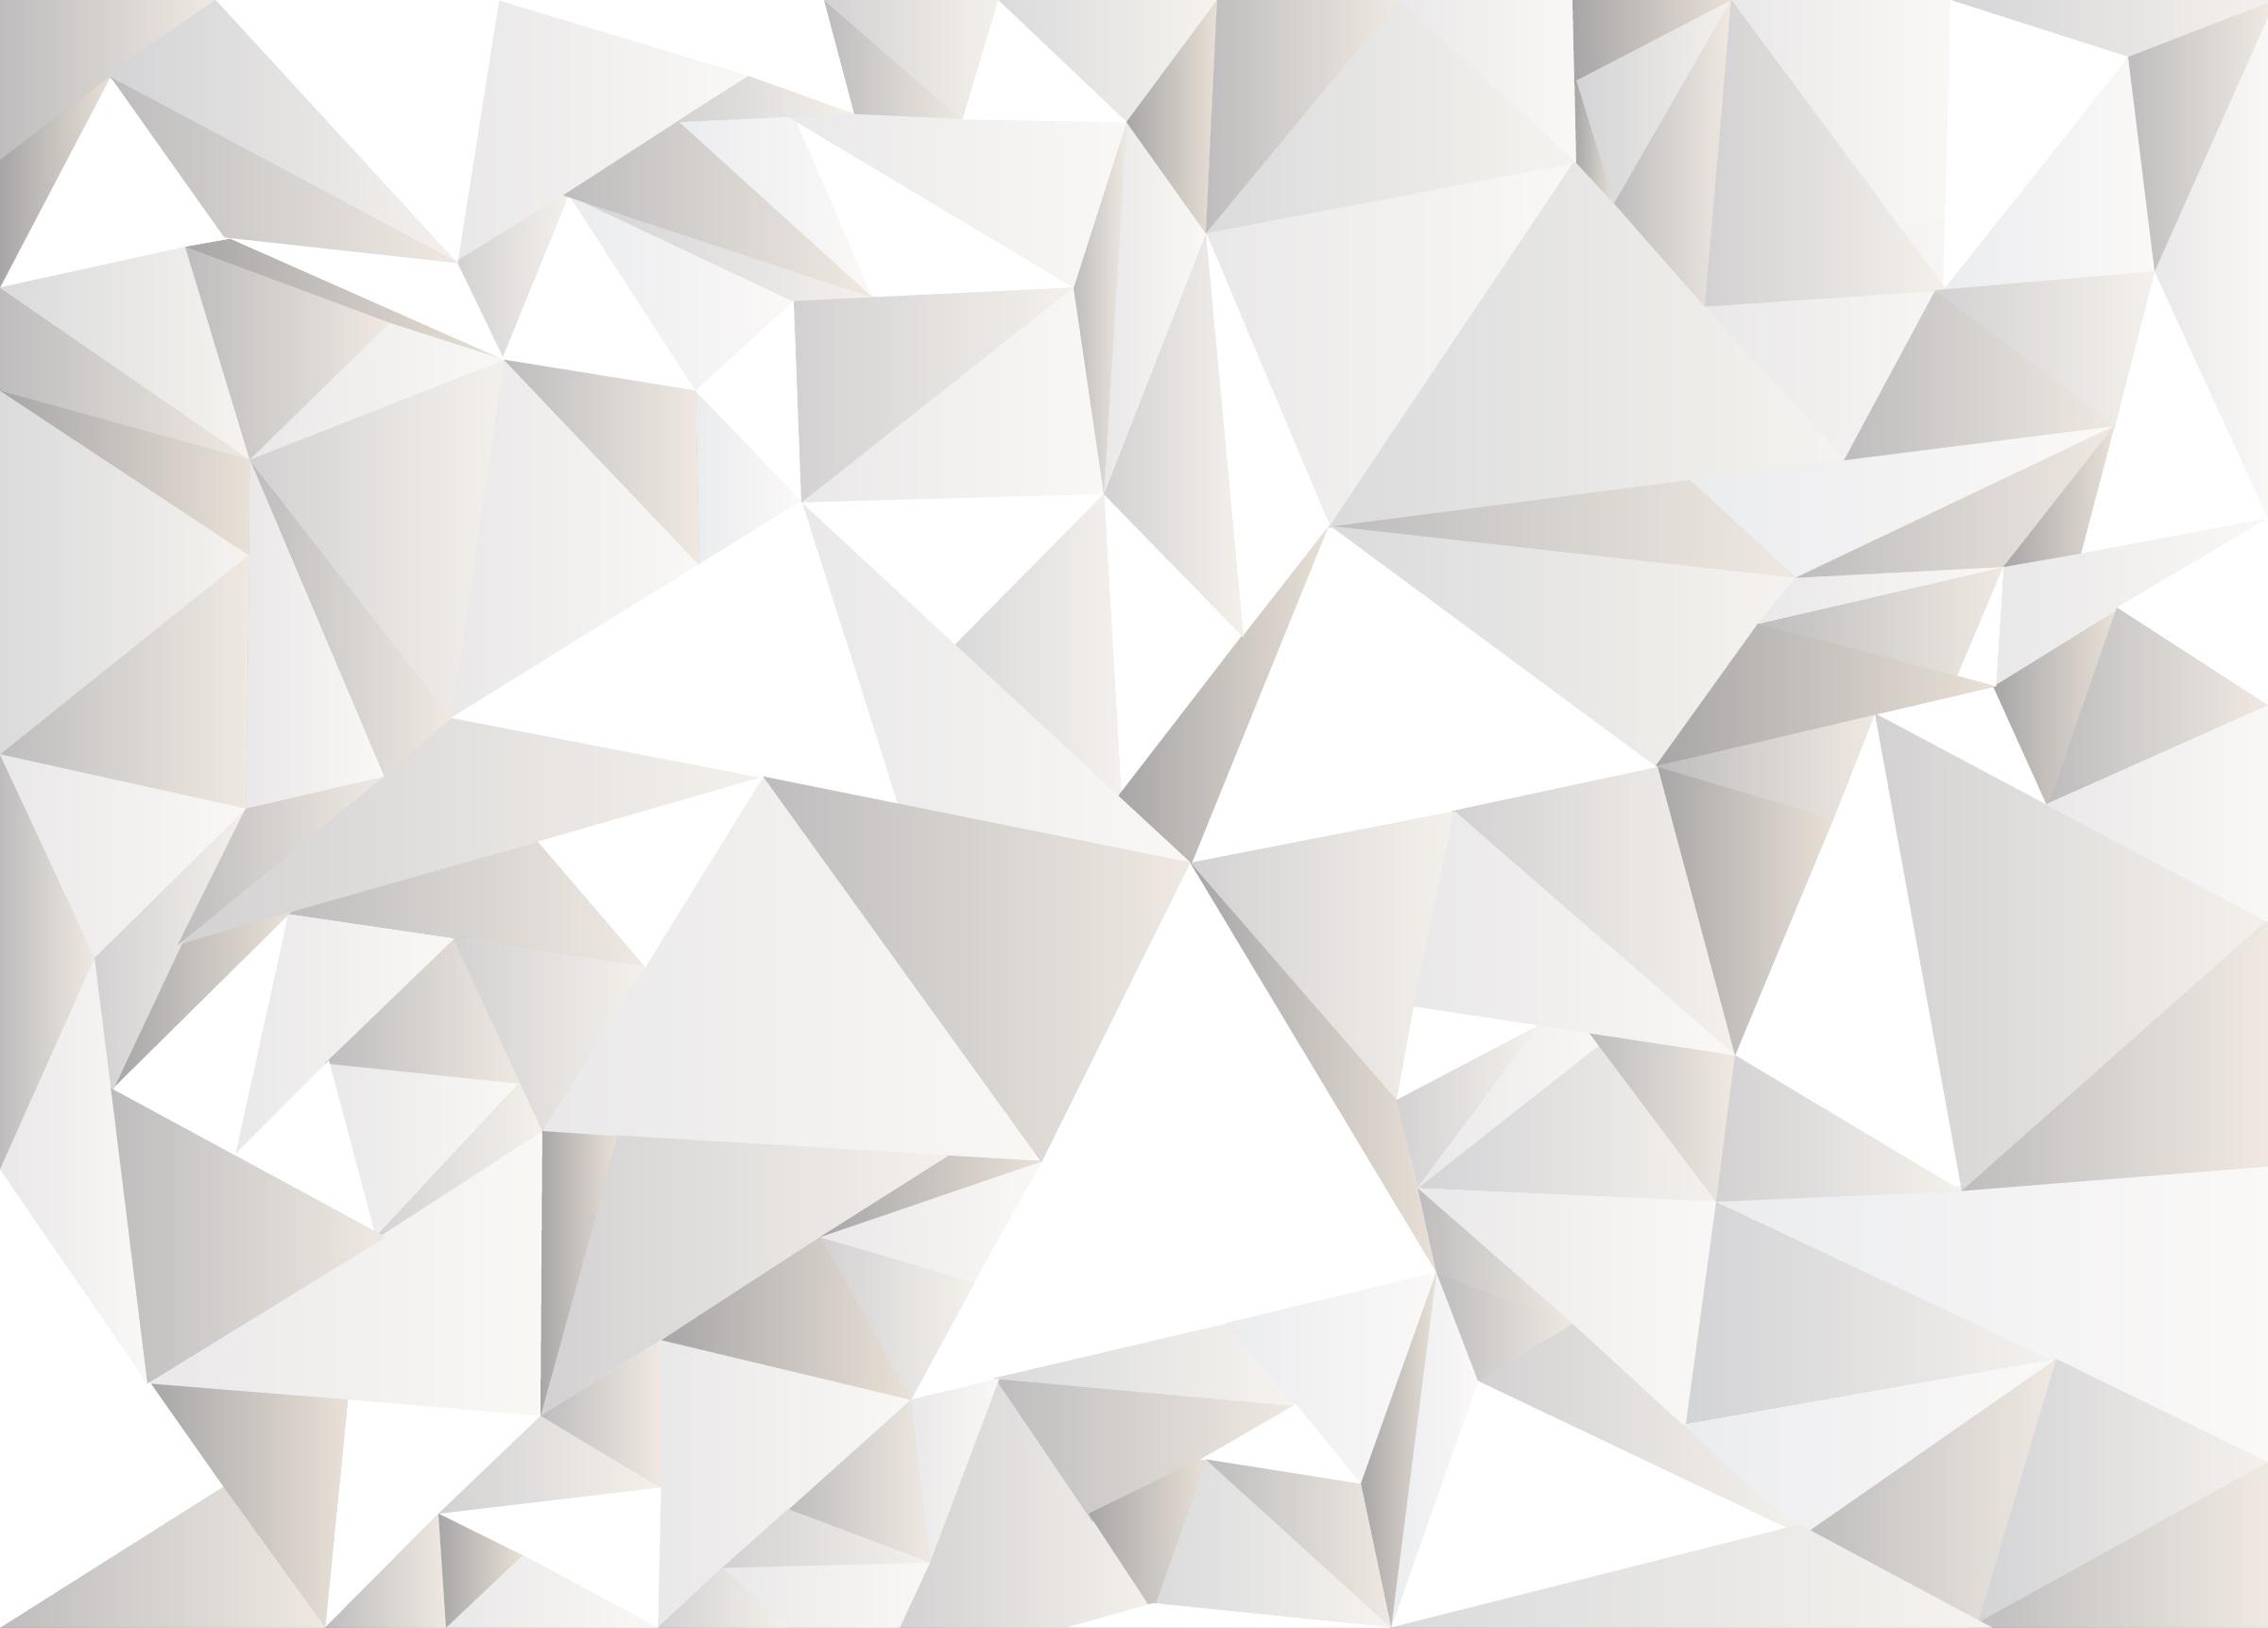 HD Wallpaper White Color Picture | Saverwallpaper com